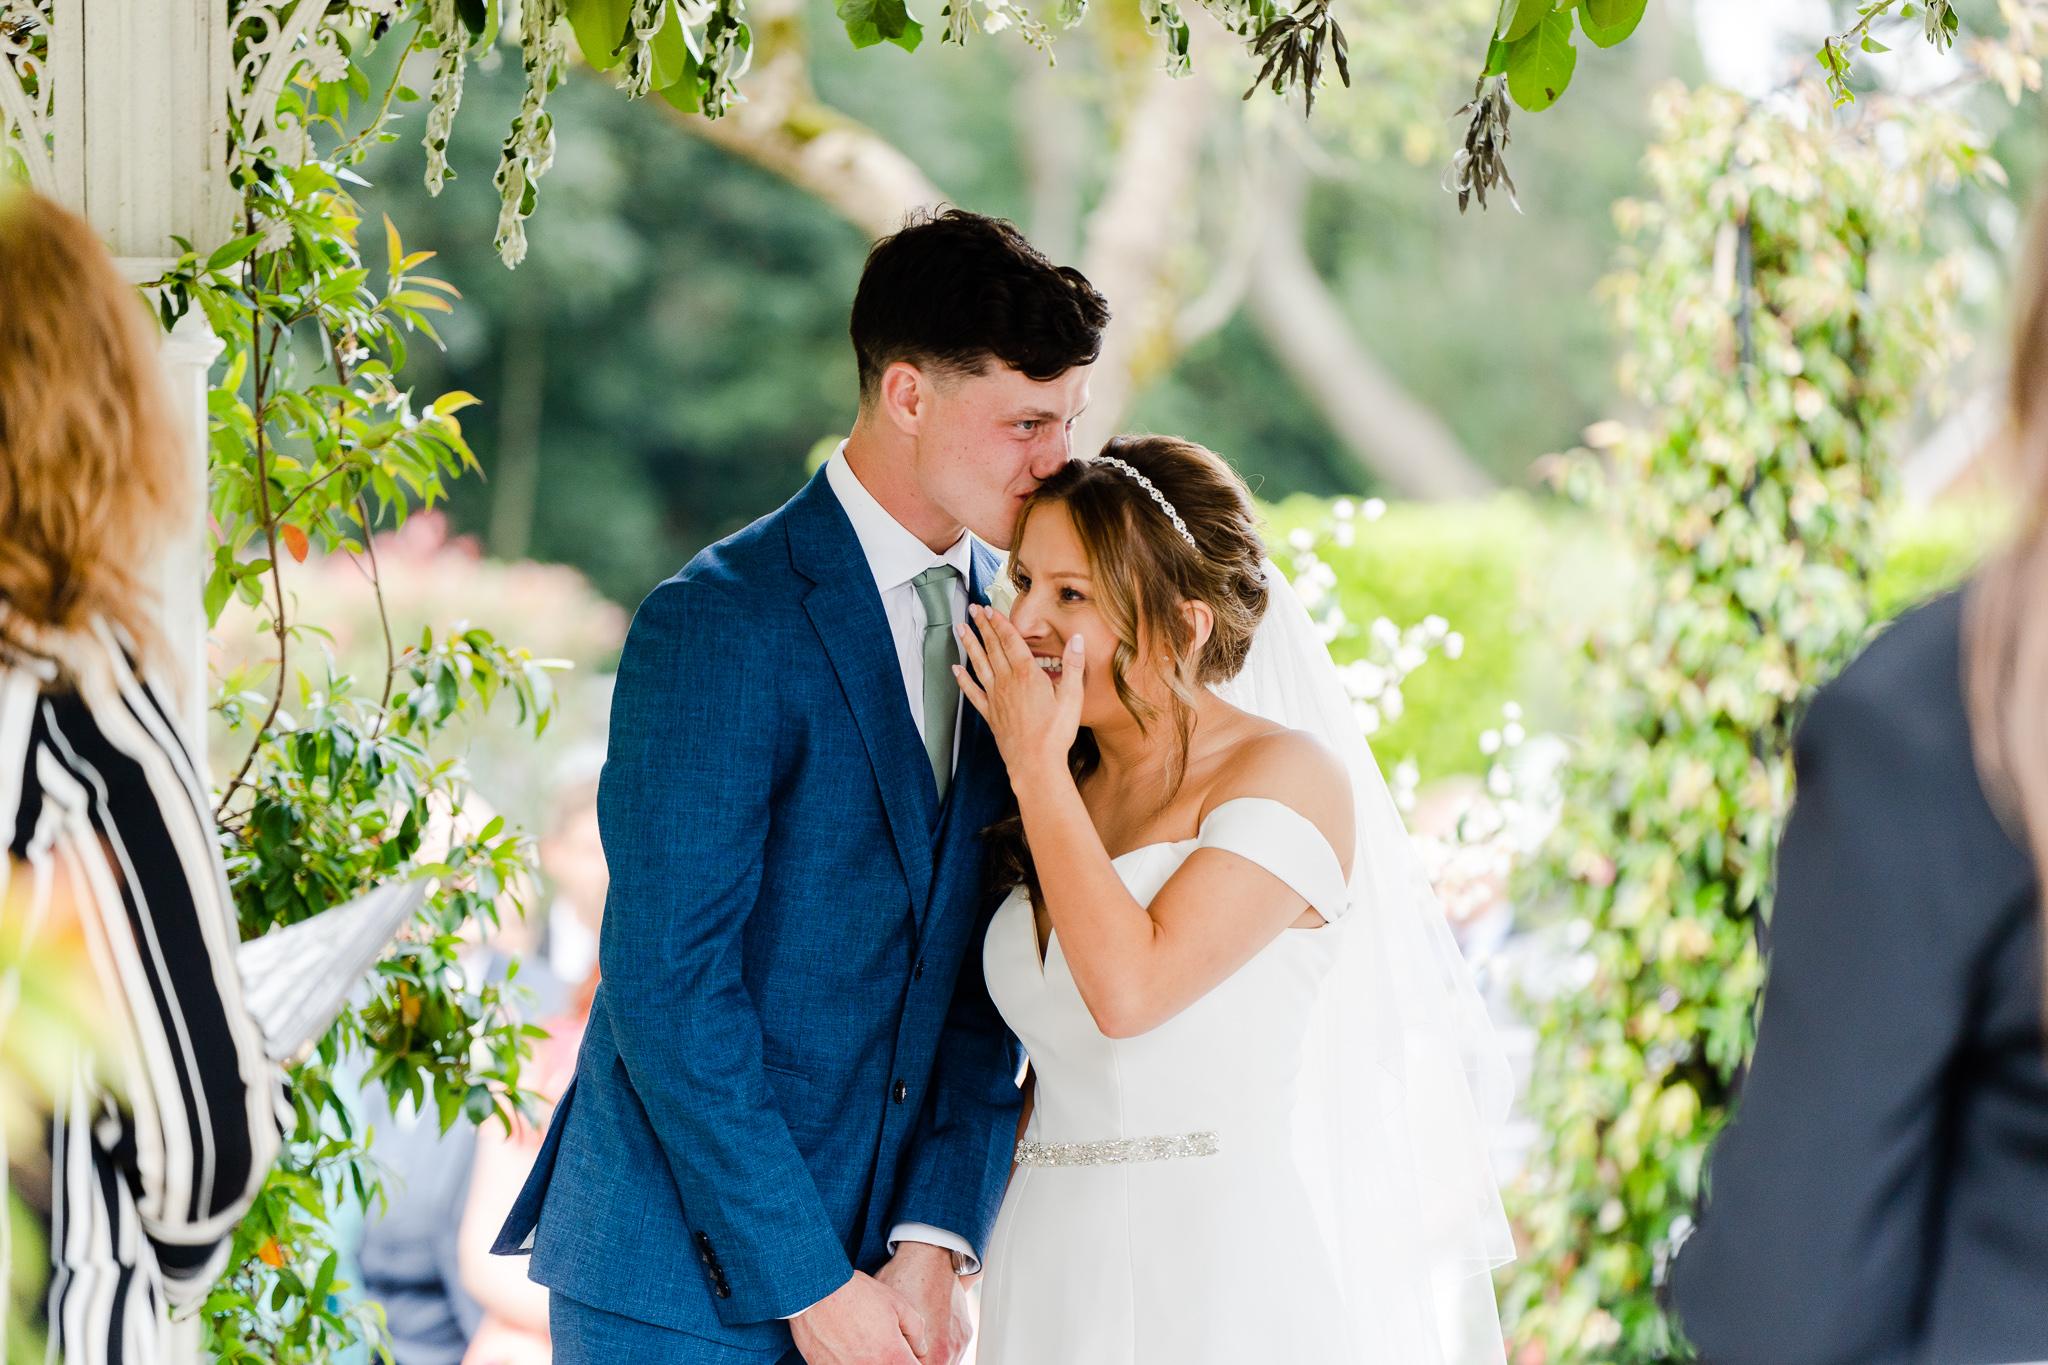 groom kissing brdie on head outside before their ceremony